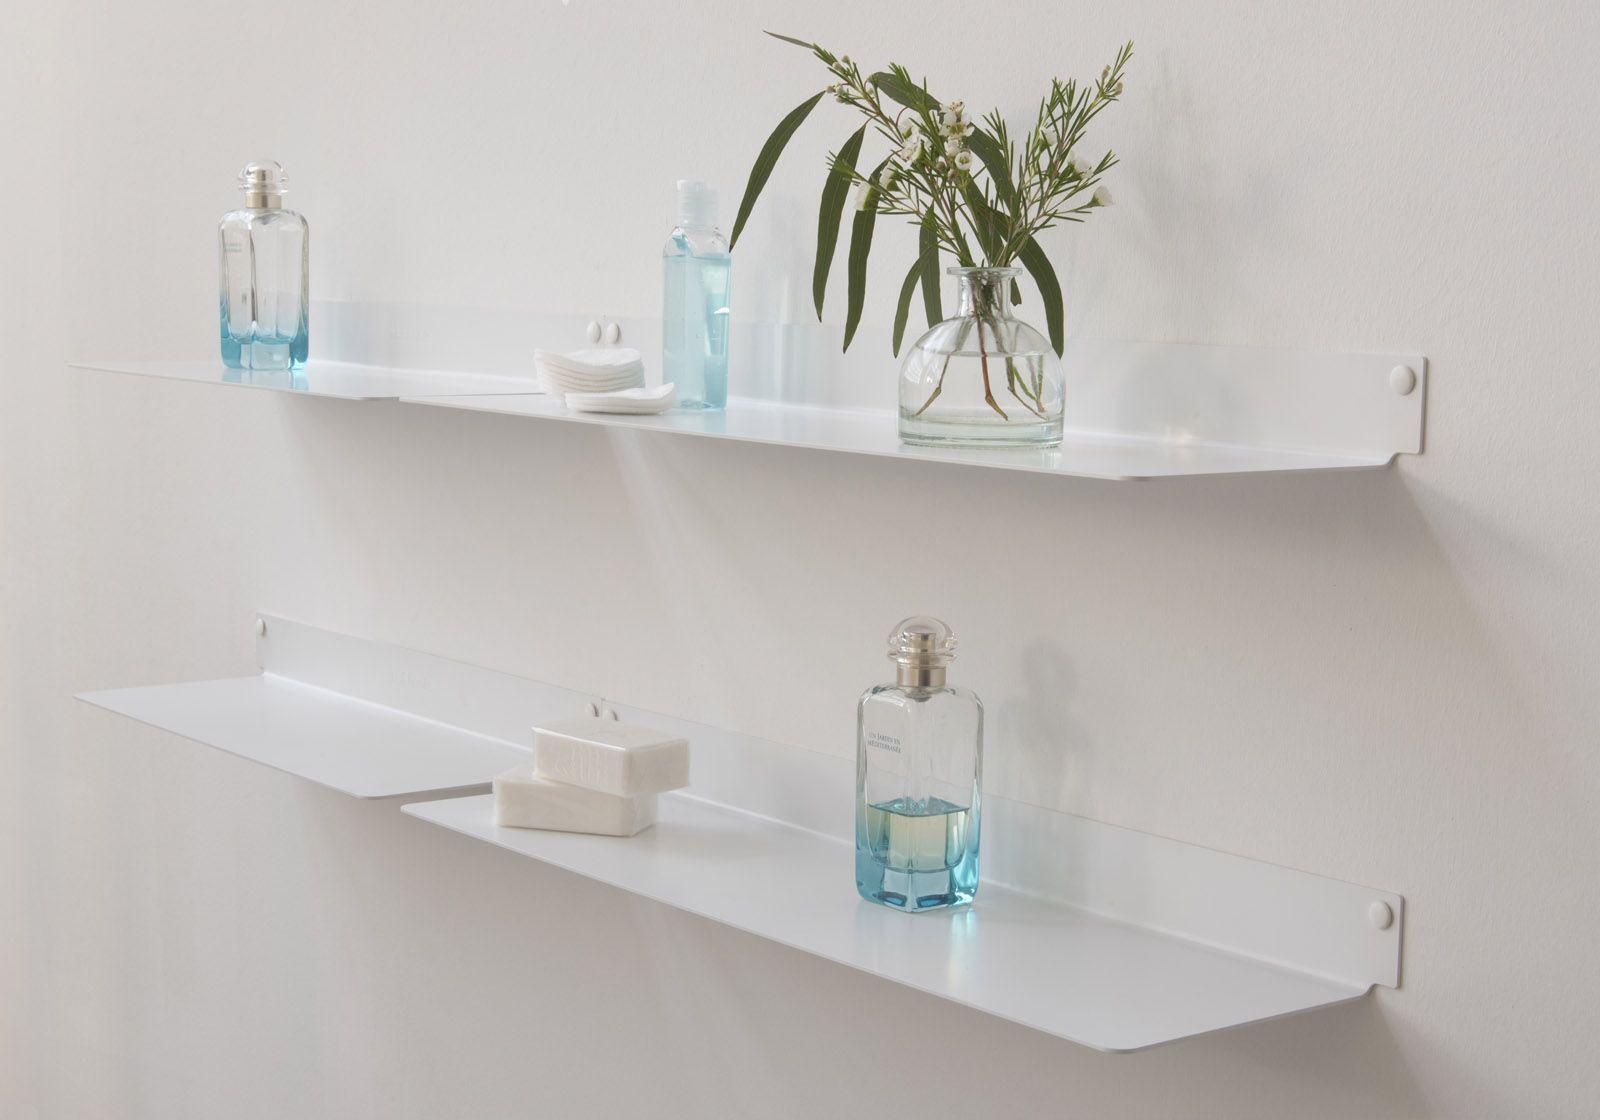 tag re salle de bain teeline 45 cm lot de 4 acier. Black Bedroom Furniture Sets. Home Design Ideas